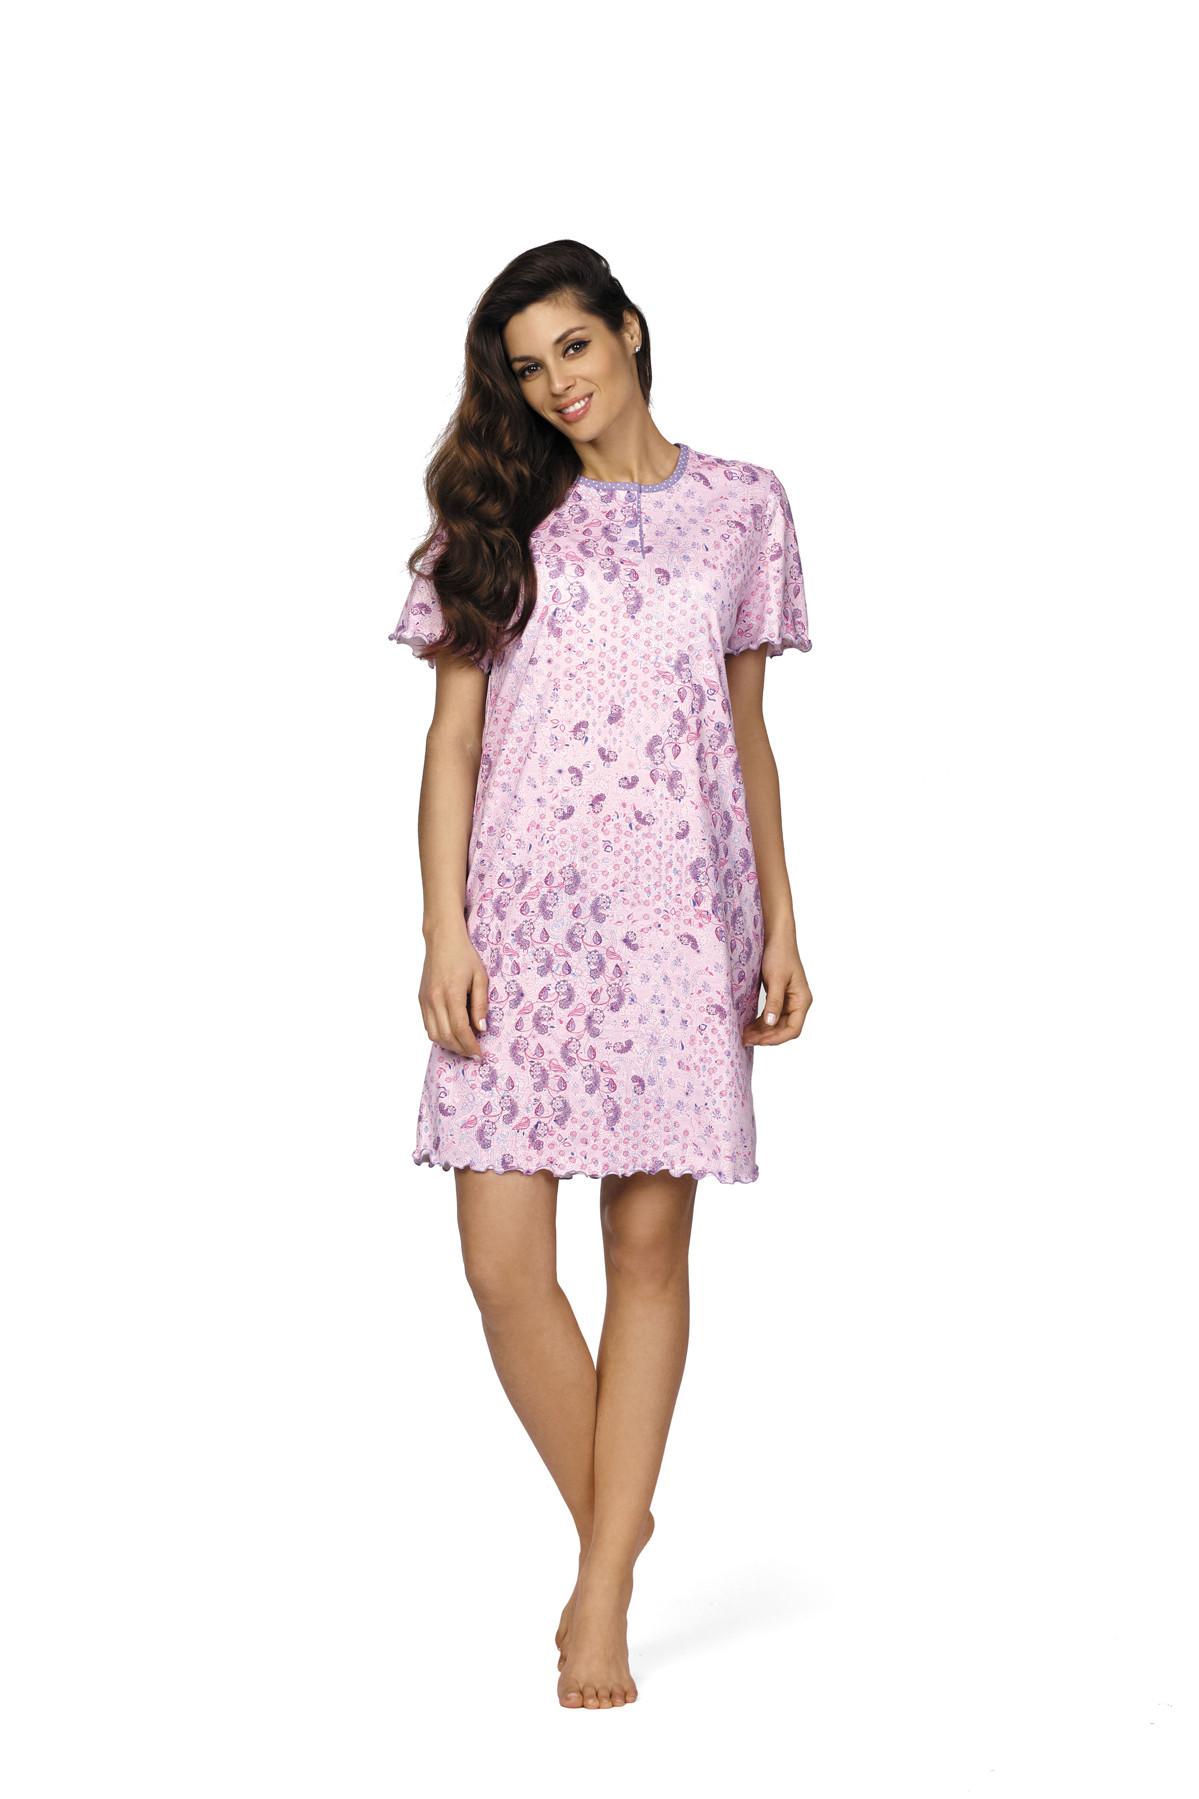 quality design b9f6f ea911 Comtessa Premium Nachthemd Schlafshirt Damen kurzer Arm rosa ...